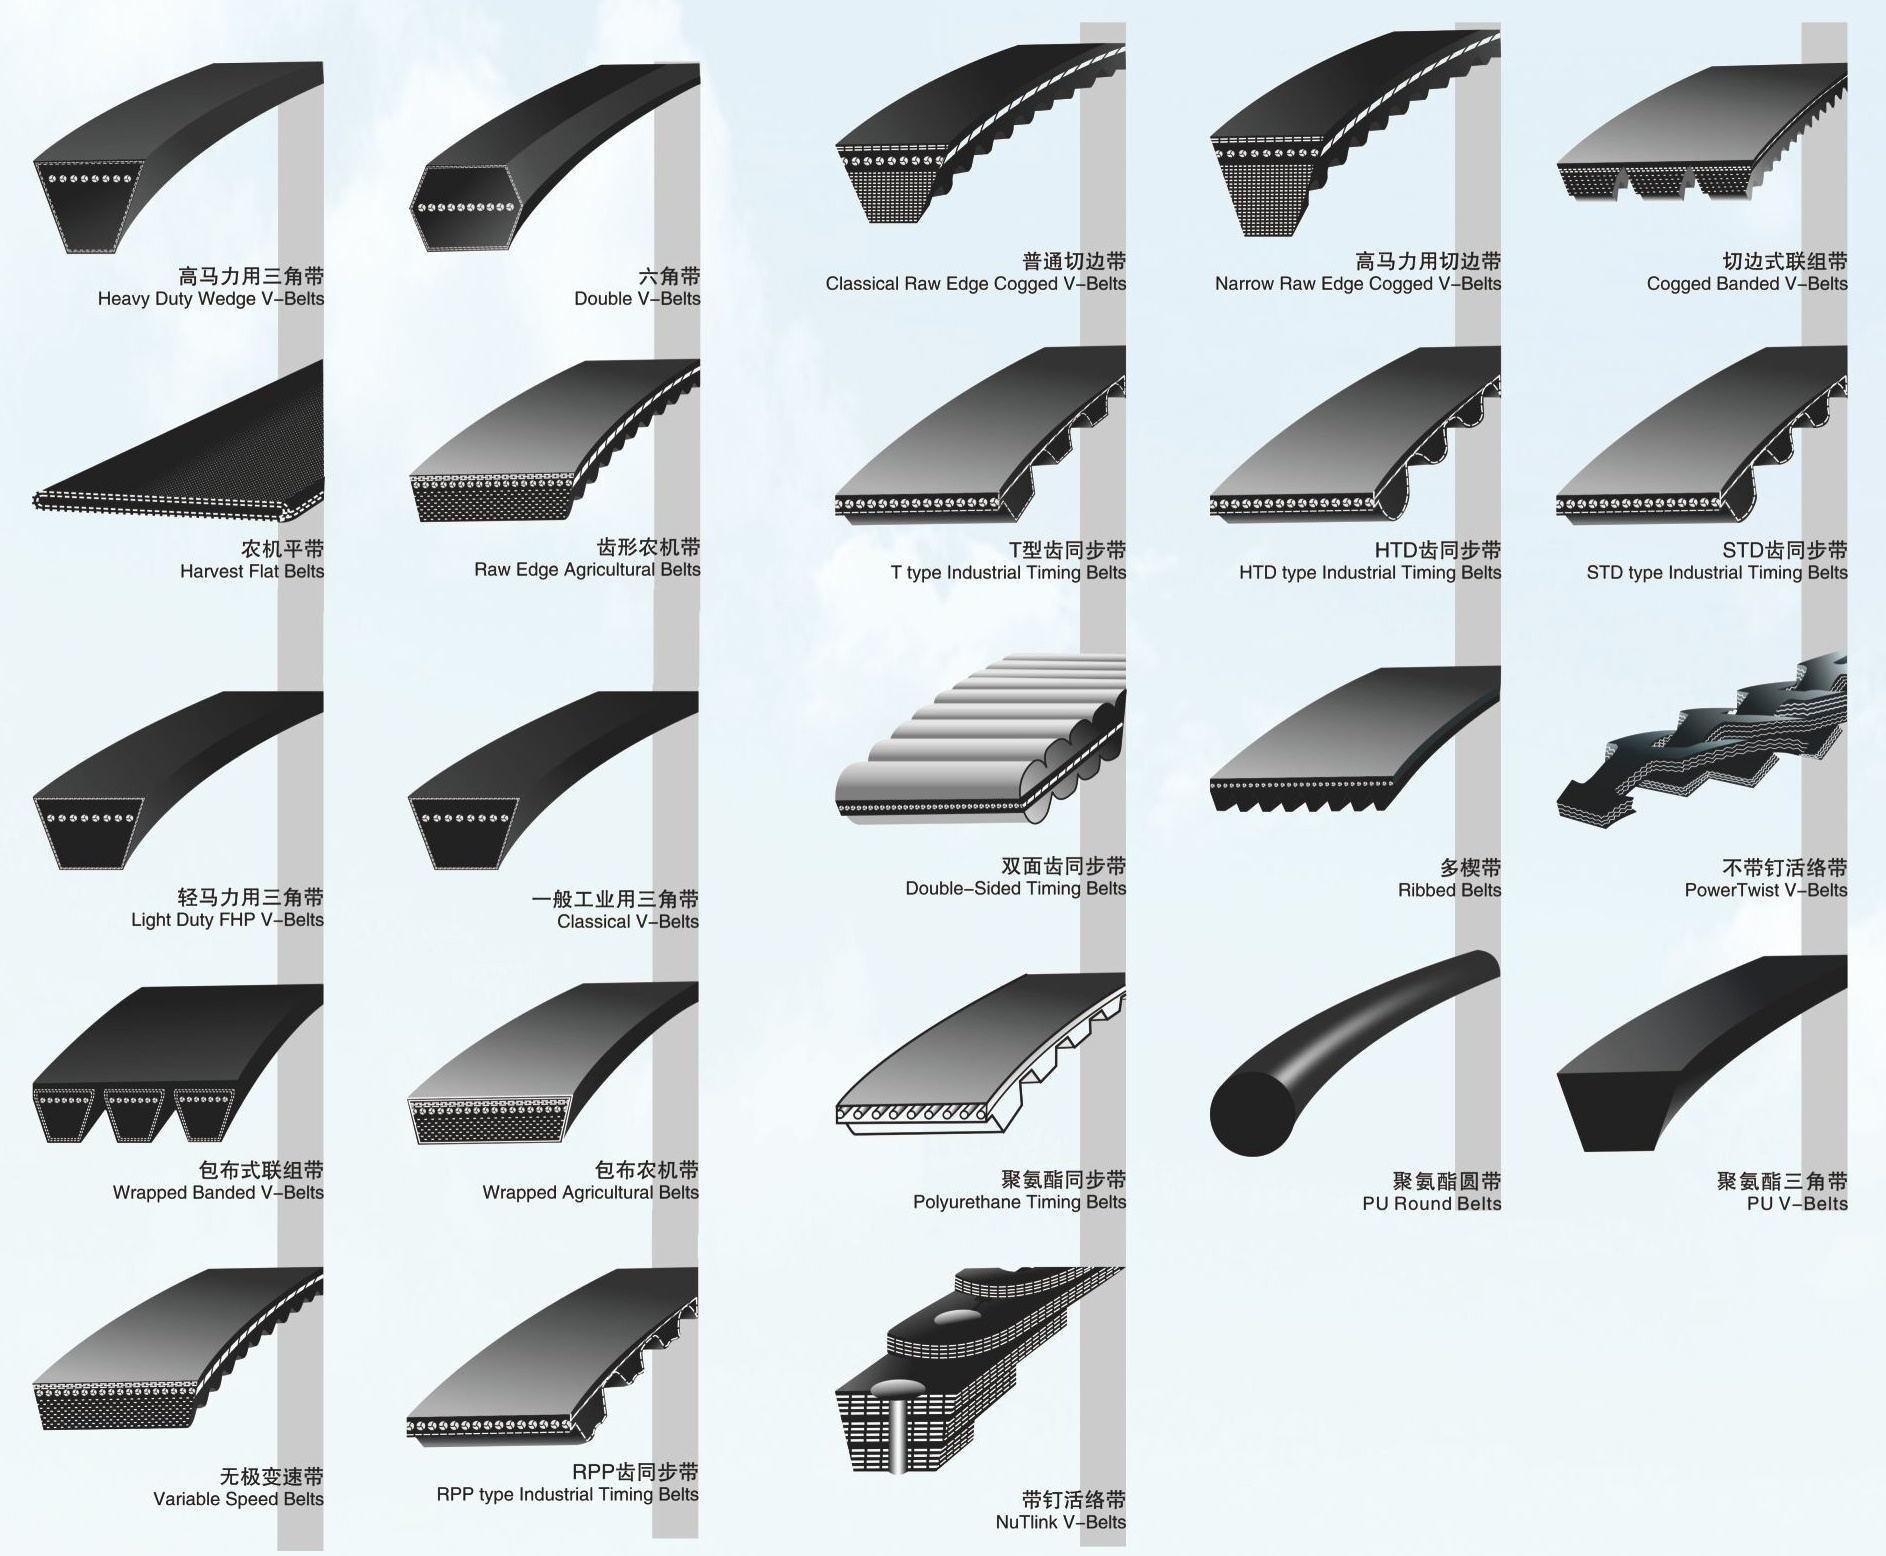 V Belt Sizes >> Poly V Belts In Little Sizes Pj336 Pj263 China V Belt V Belt